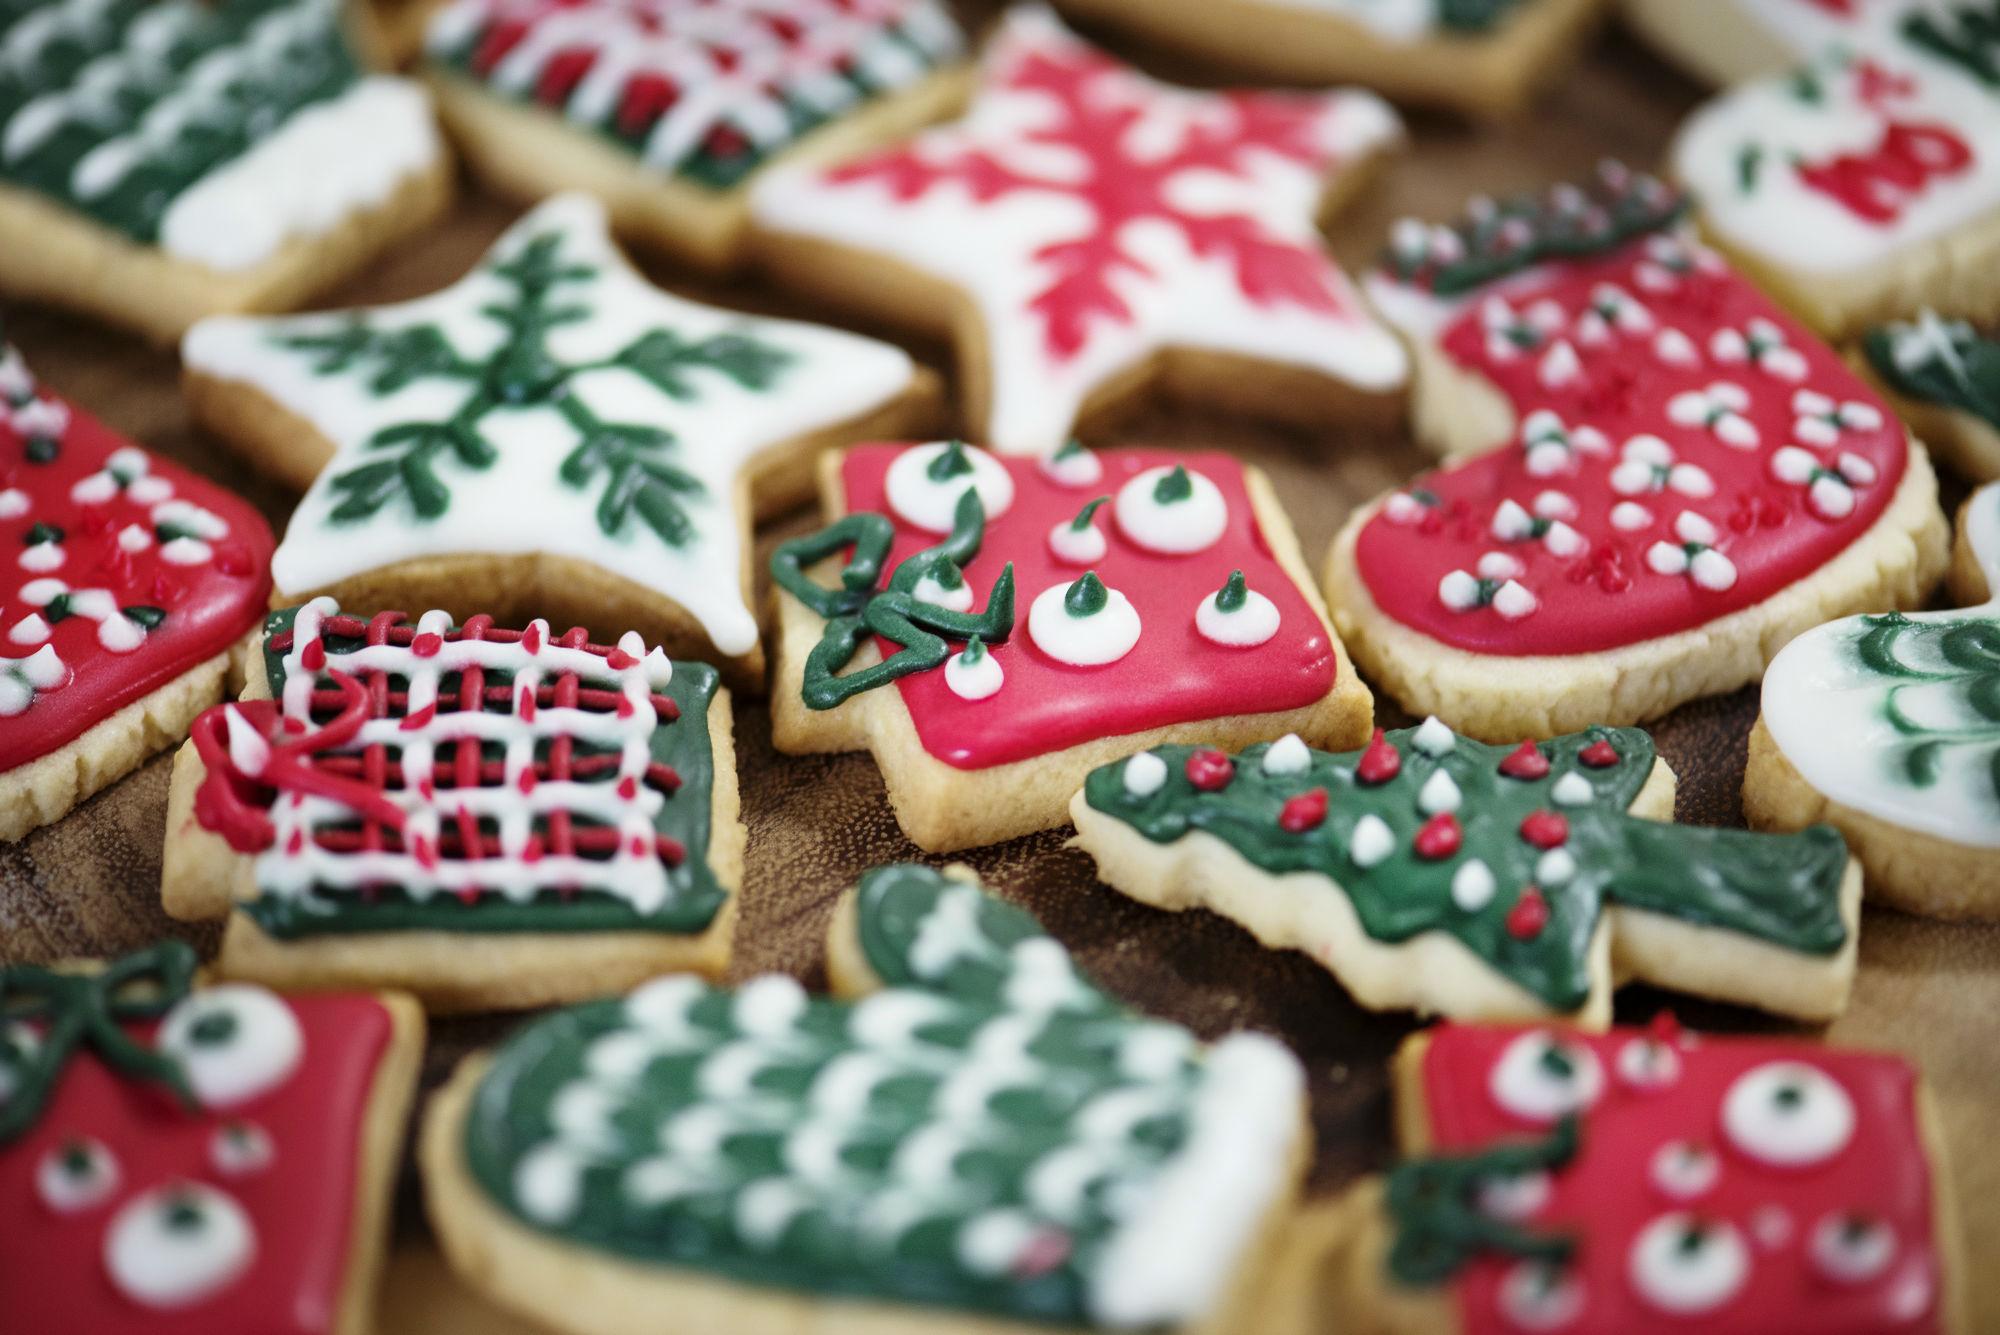 Christmas Cookies Attract Pests at Christmas